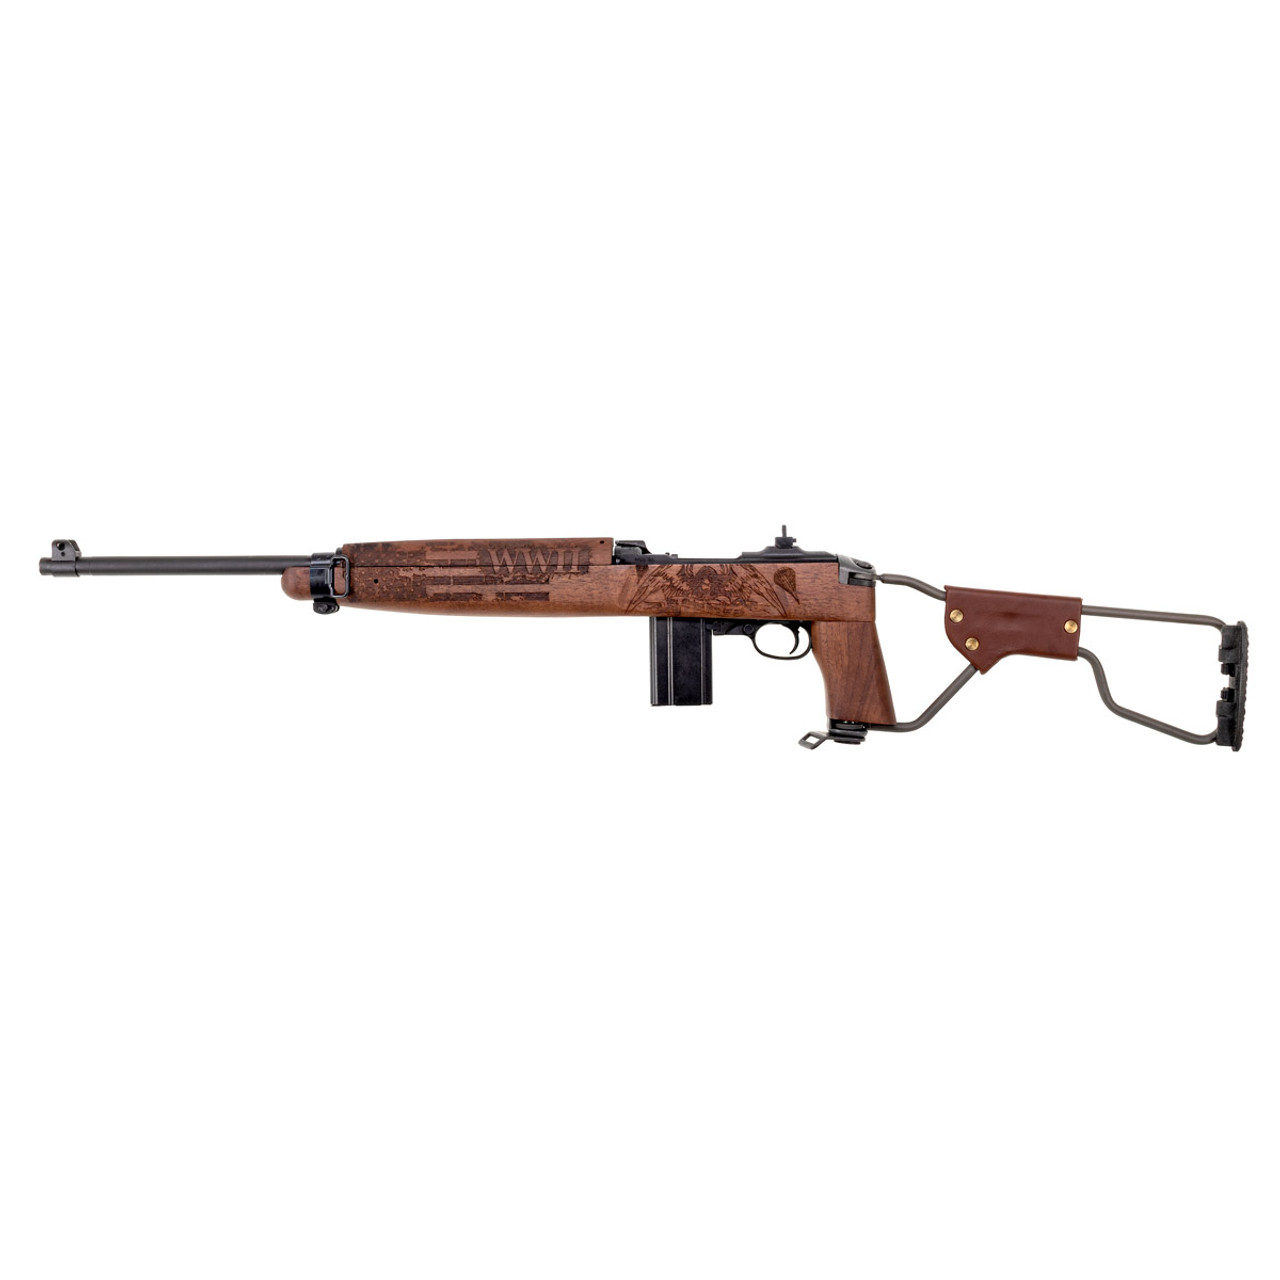 3c23daf7eefd2a M1 Carbine